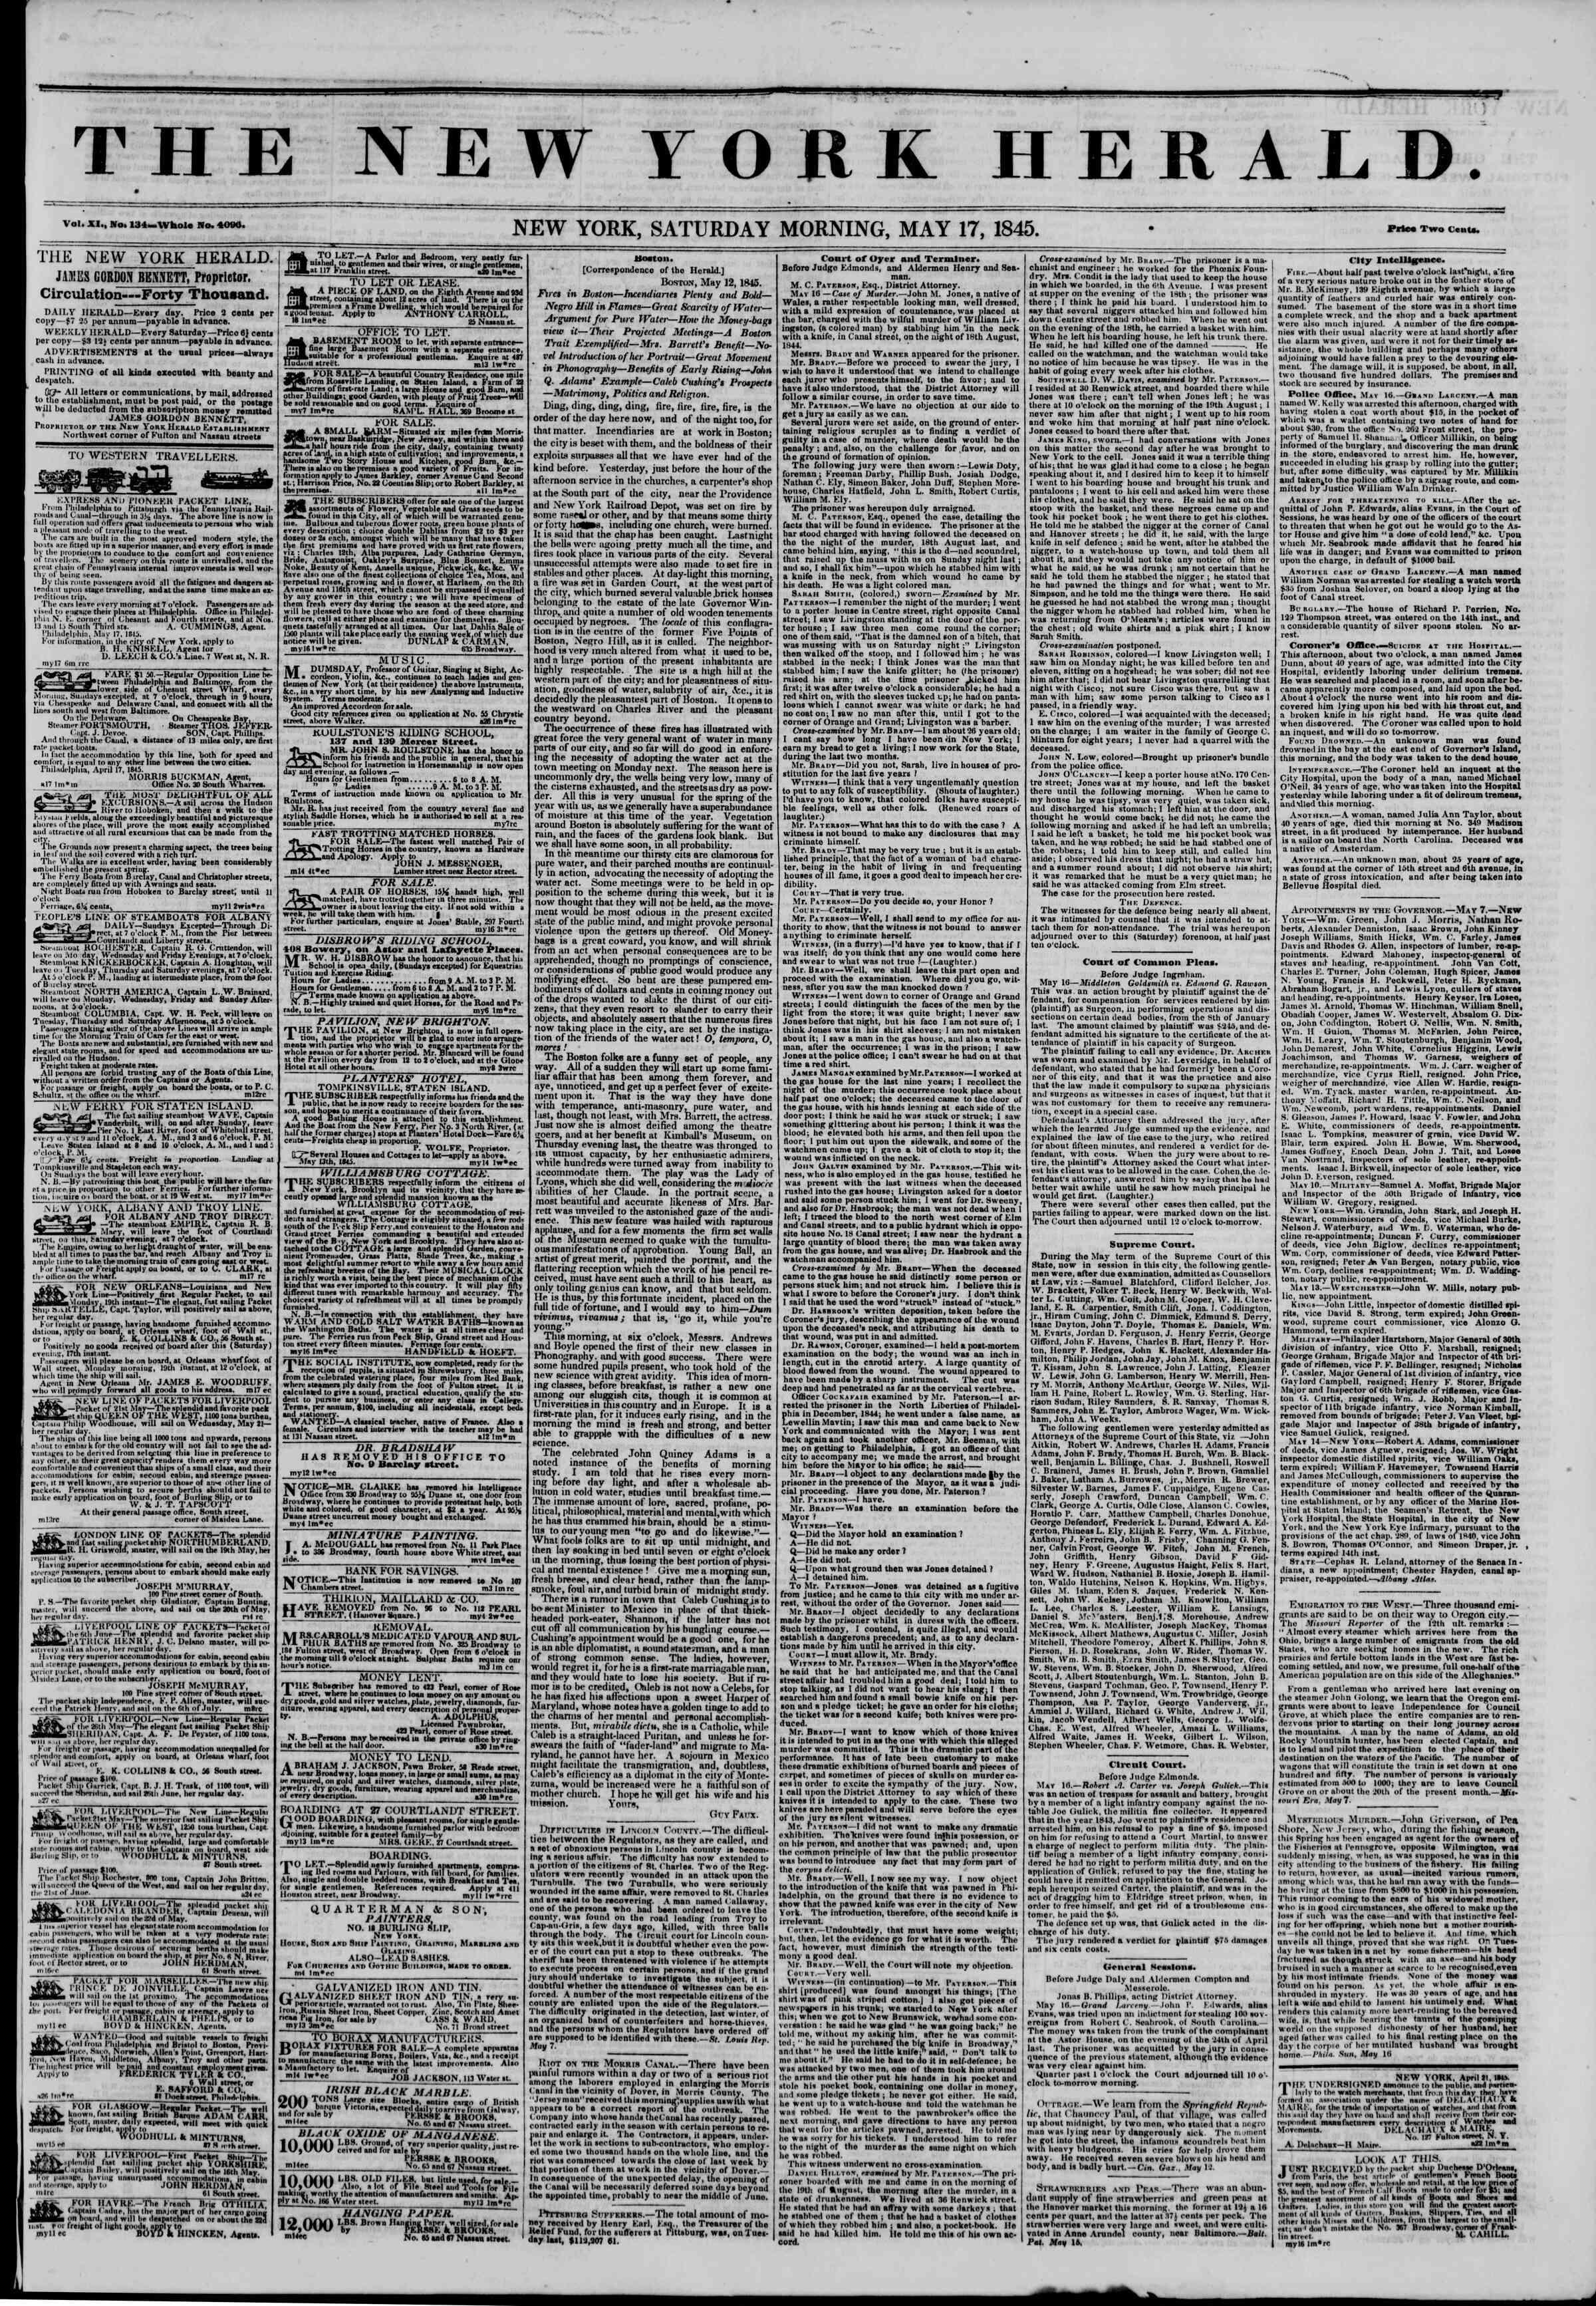 May 17, 1845 Tarihli The New York Herald Gazetesi Sayfa 1